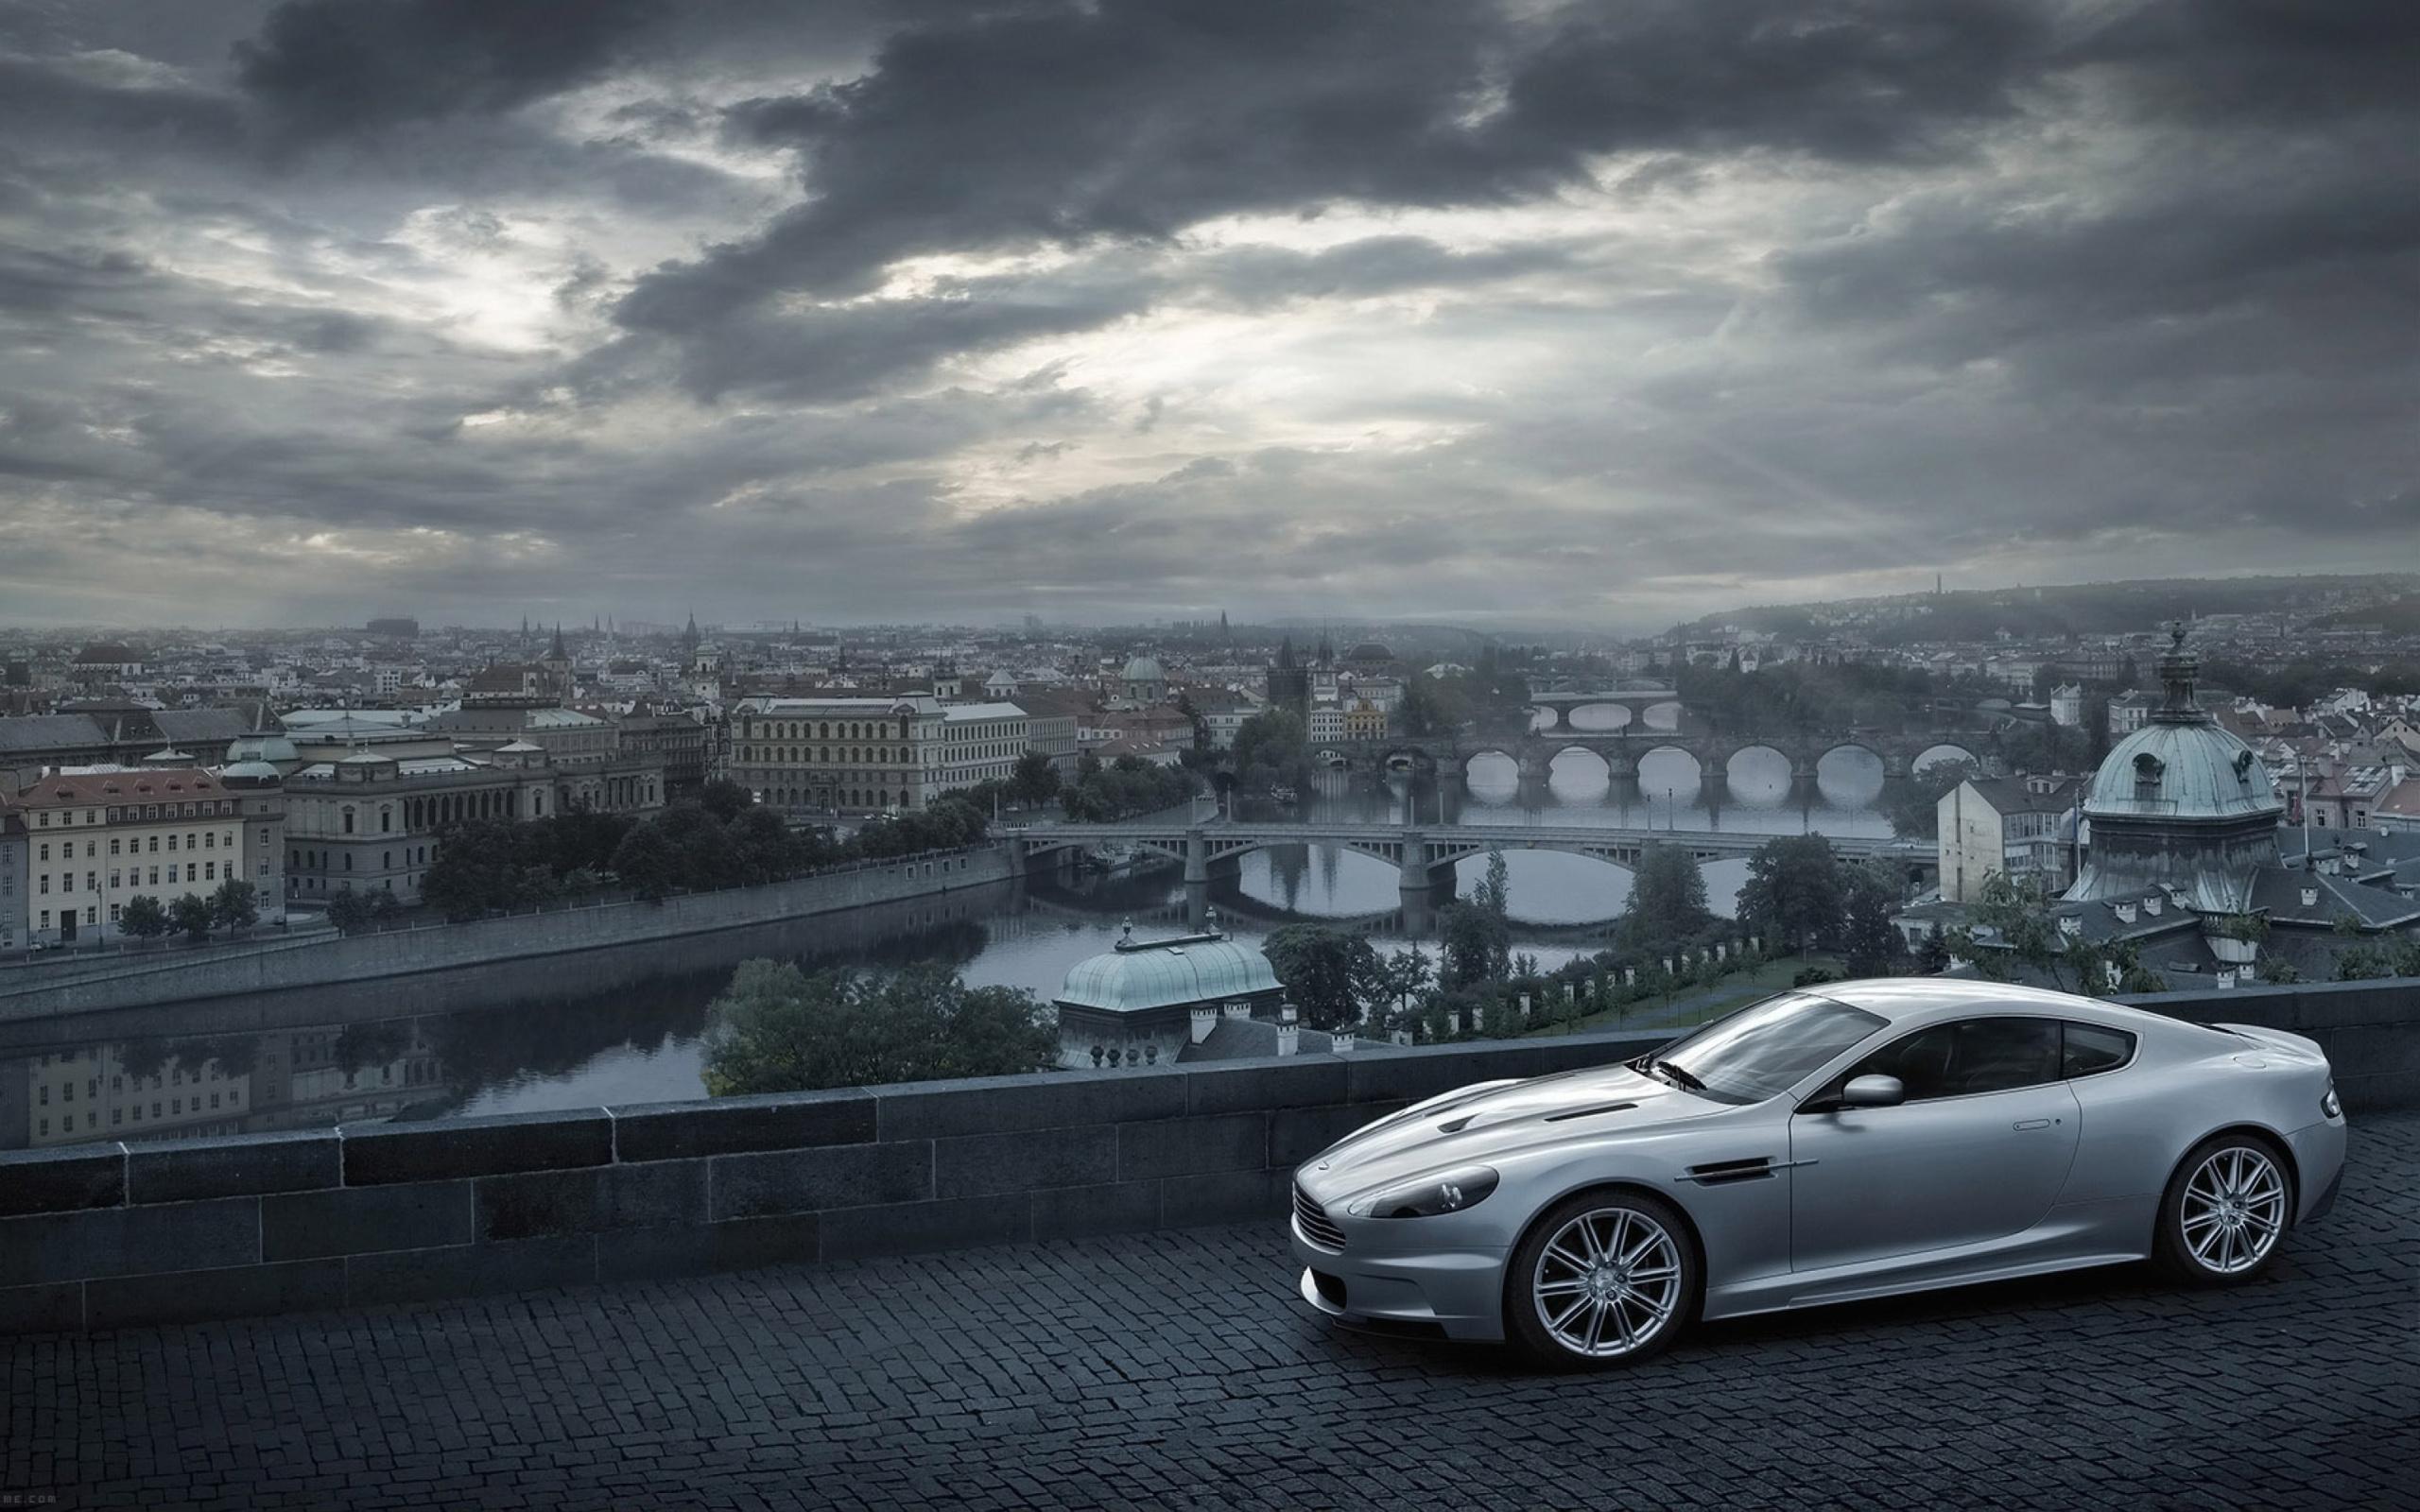 Aston Martin суперкар ночь город  № 2374799 загрузить